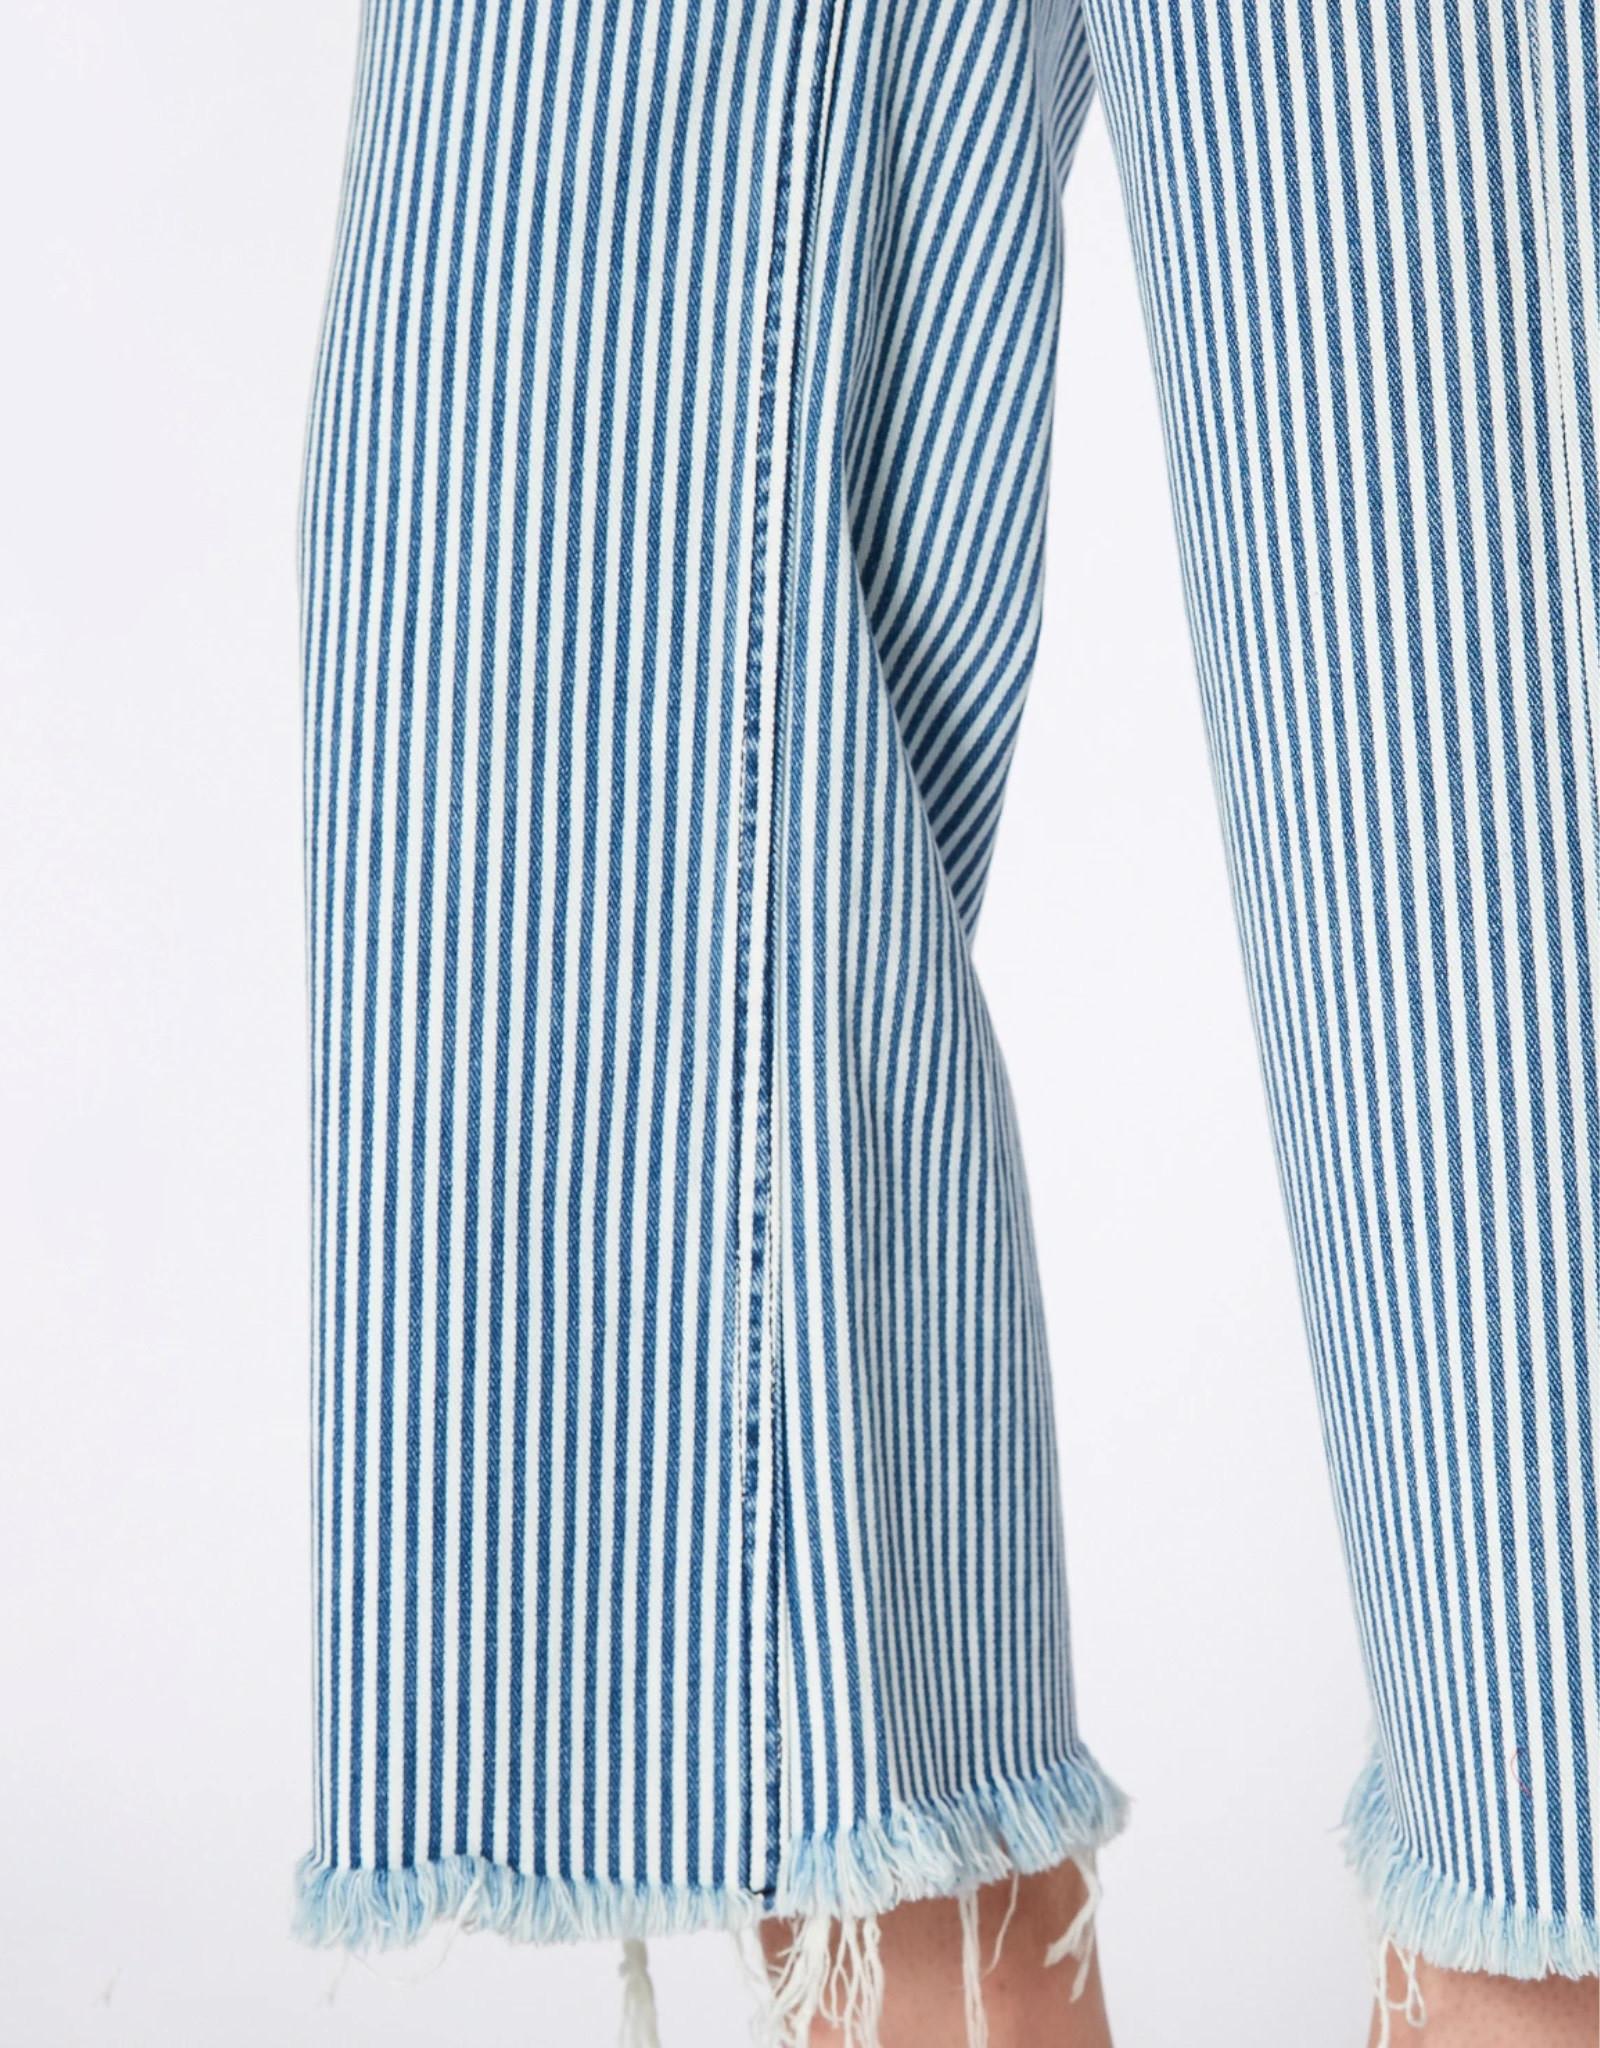 NOEND Hailey Culotte Jeans in Luce Stripe